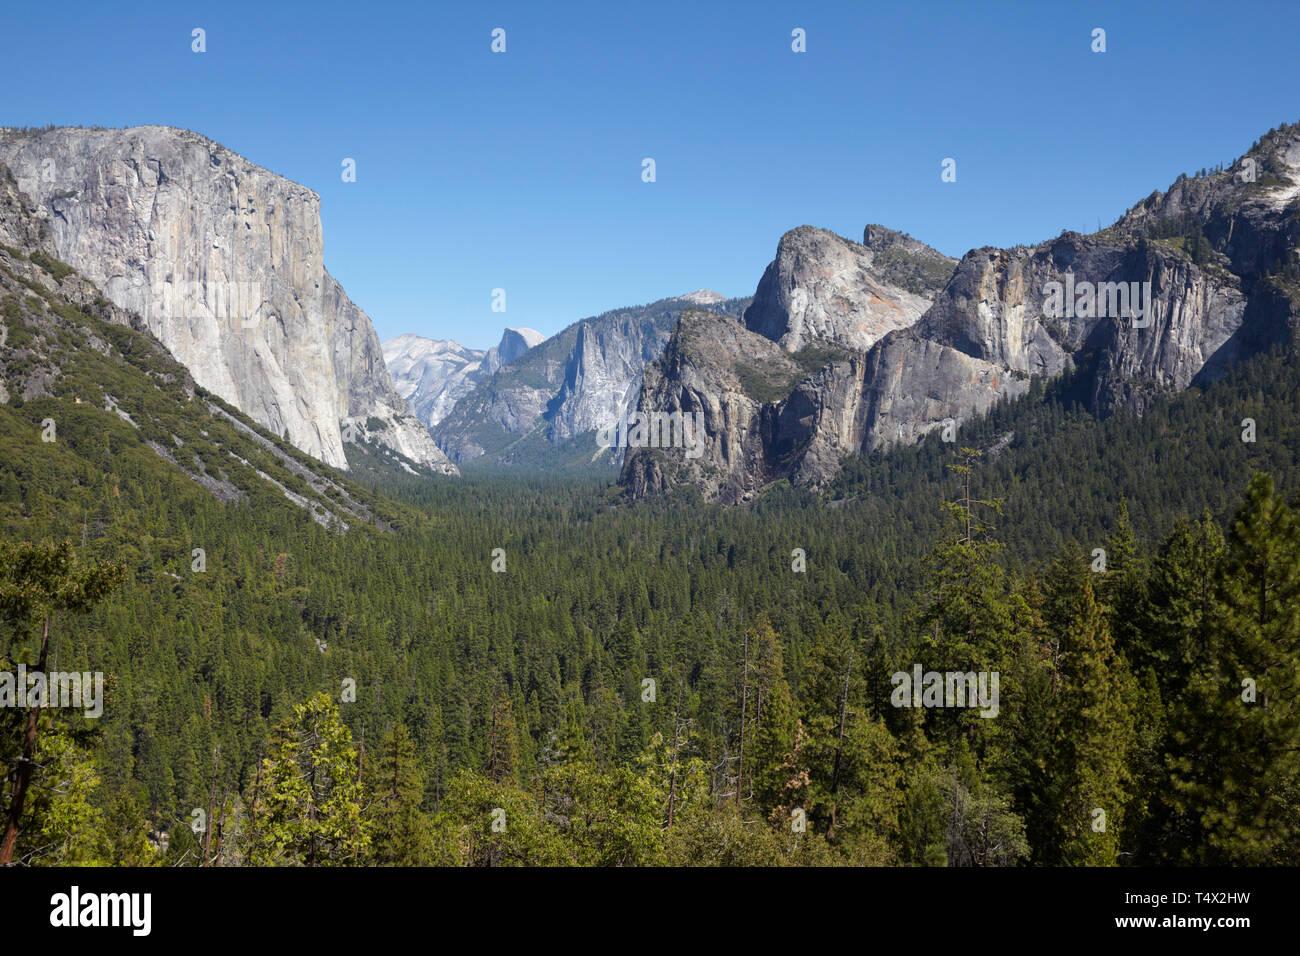 Yosemitie Valley, Half Dome and El Capitan from Tunnel View, Yosemiti National Park, California. Stock Photo